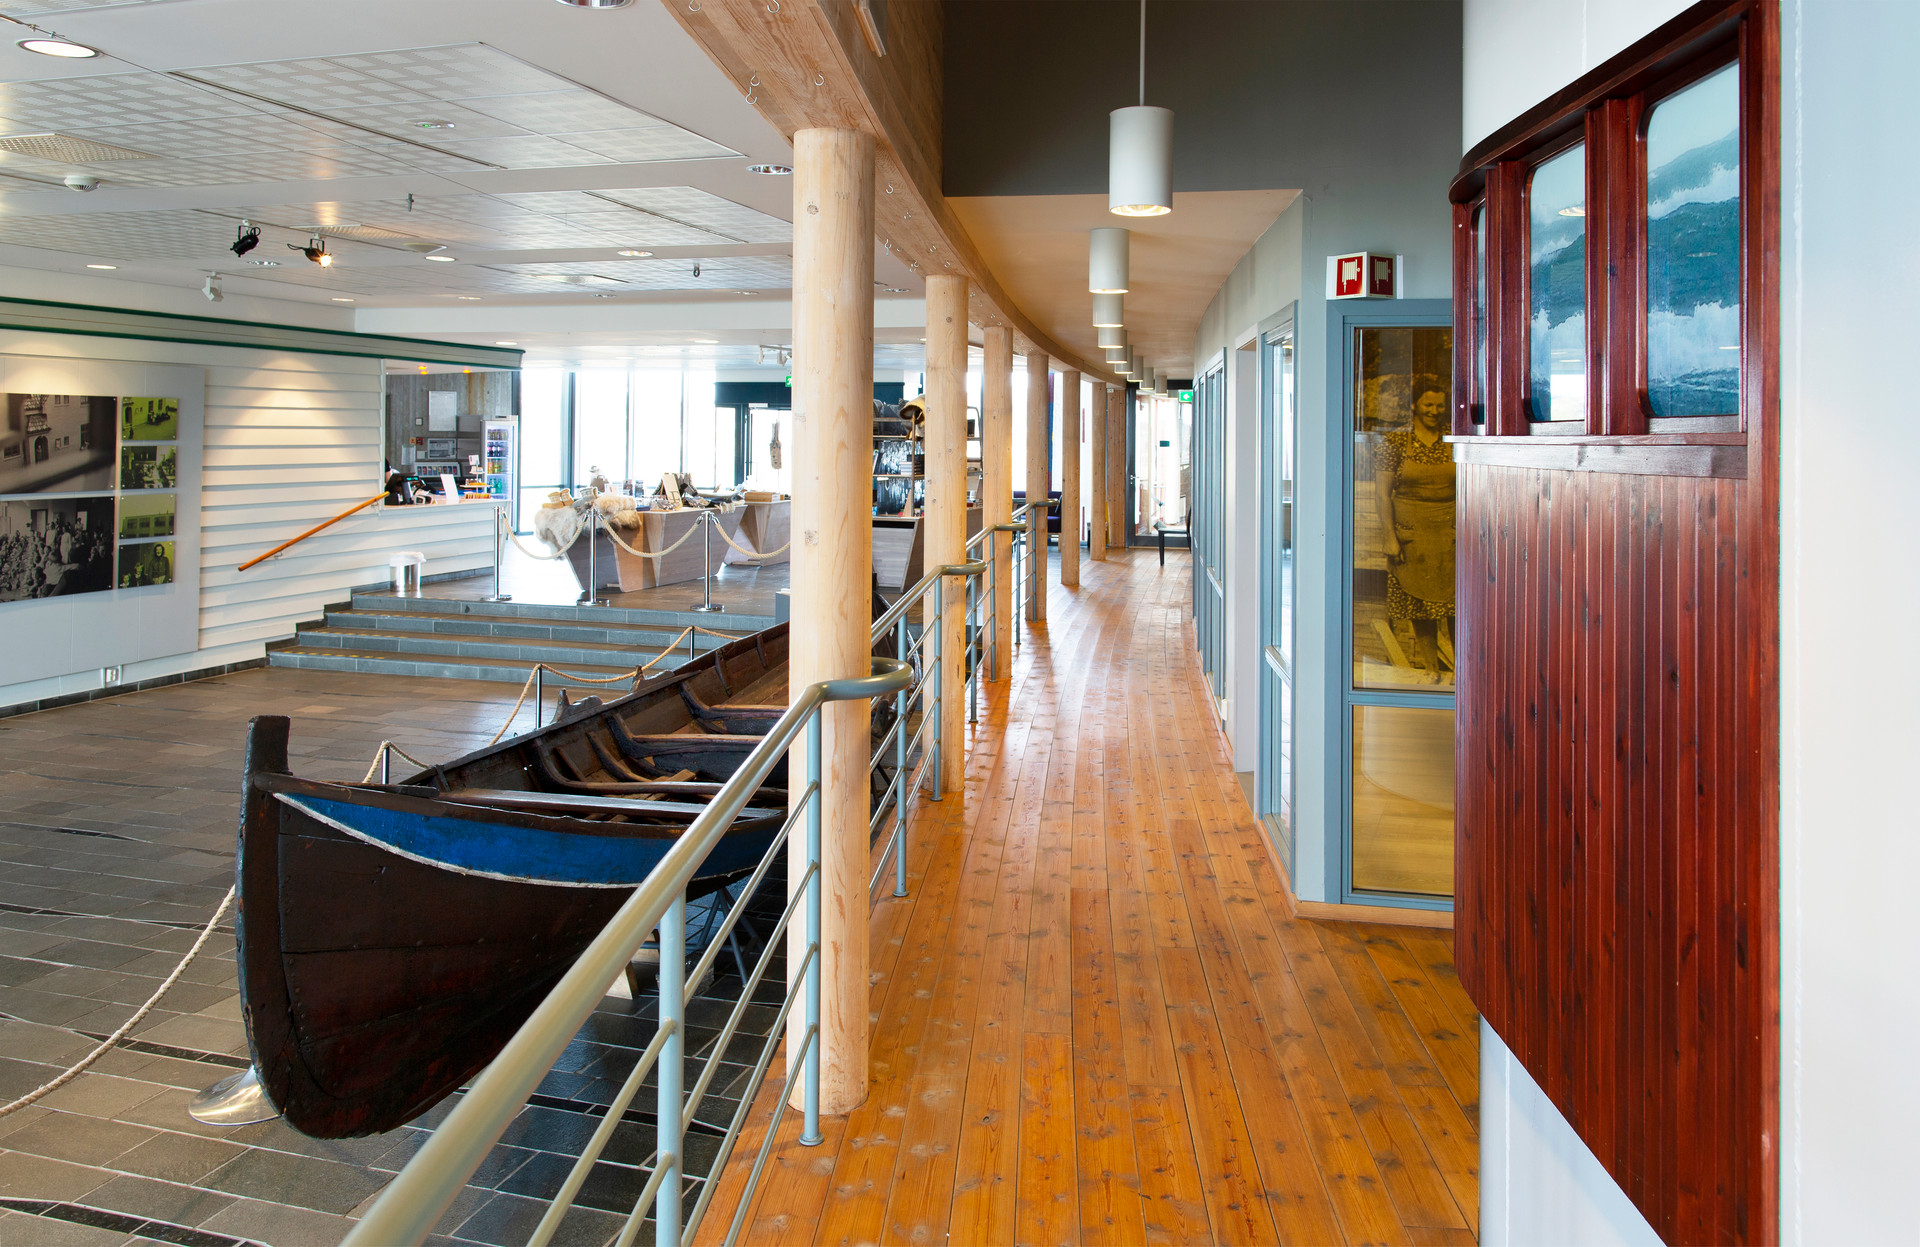 Kahrs_ny_Nordsjøfartmuseet-0675.jpg